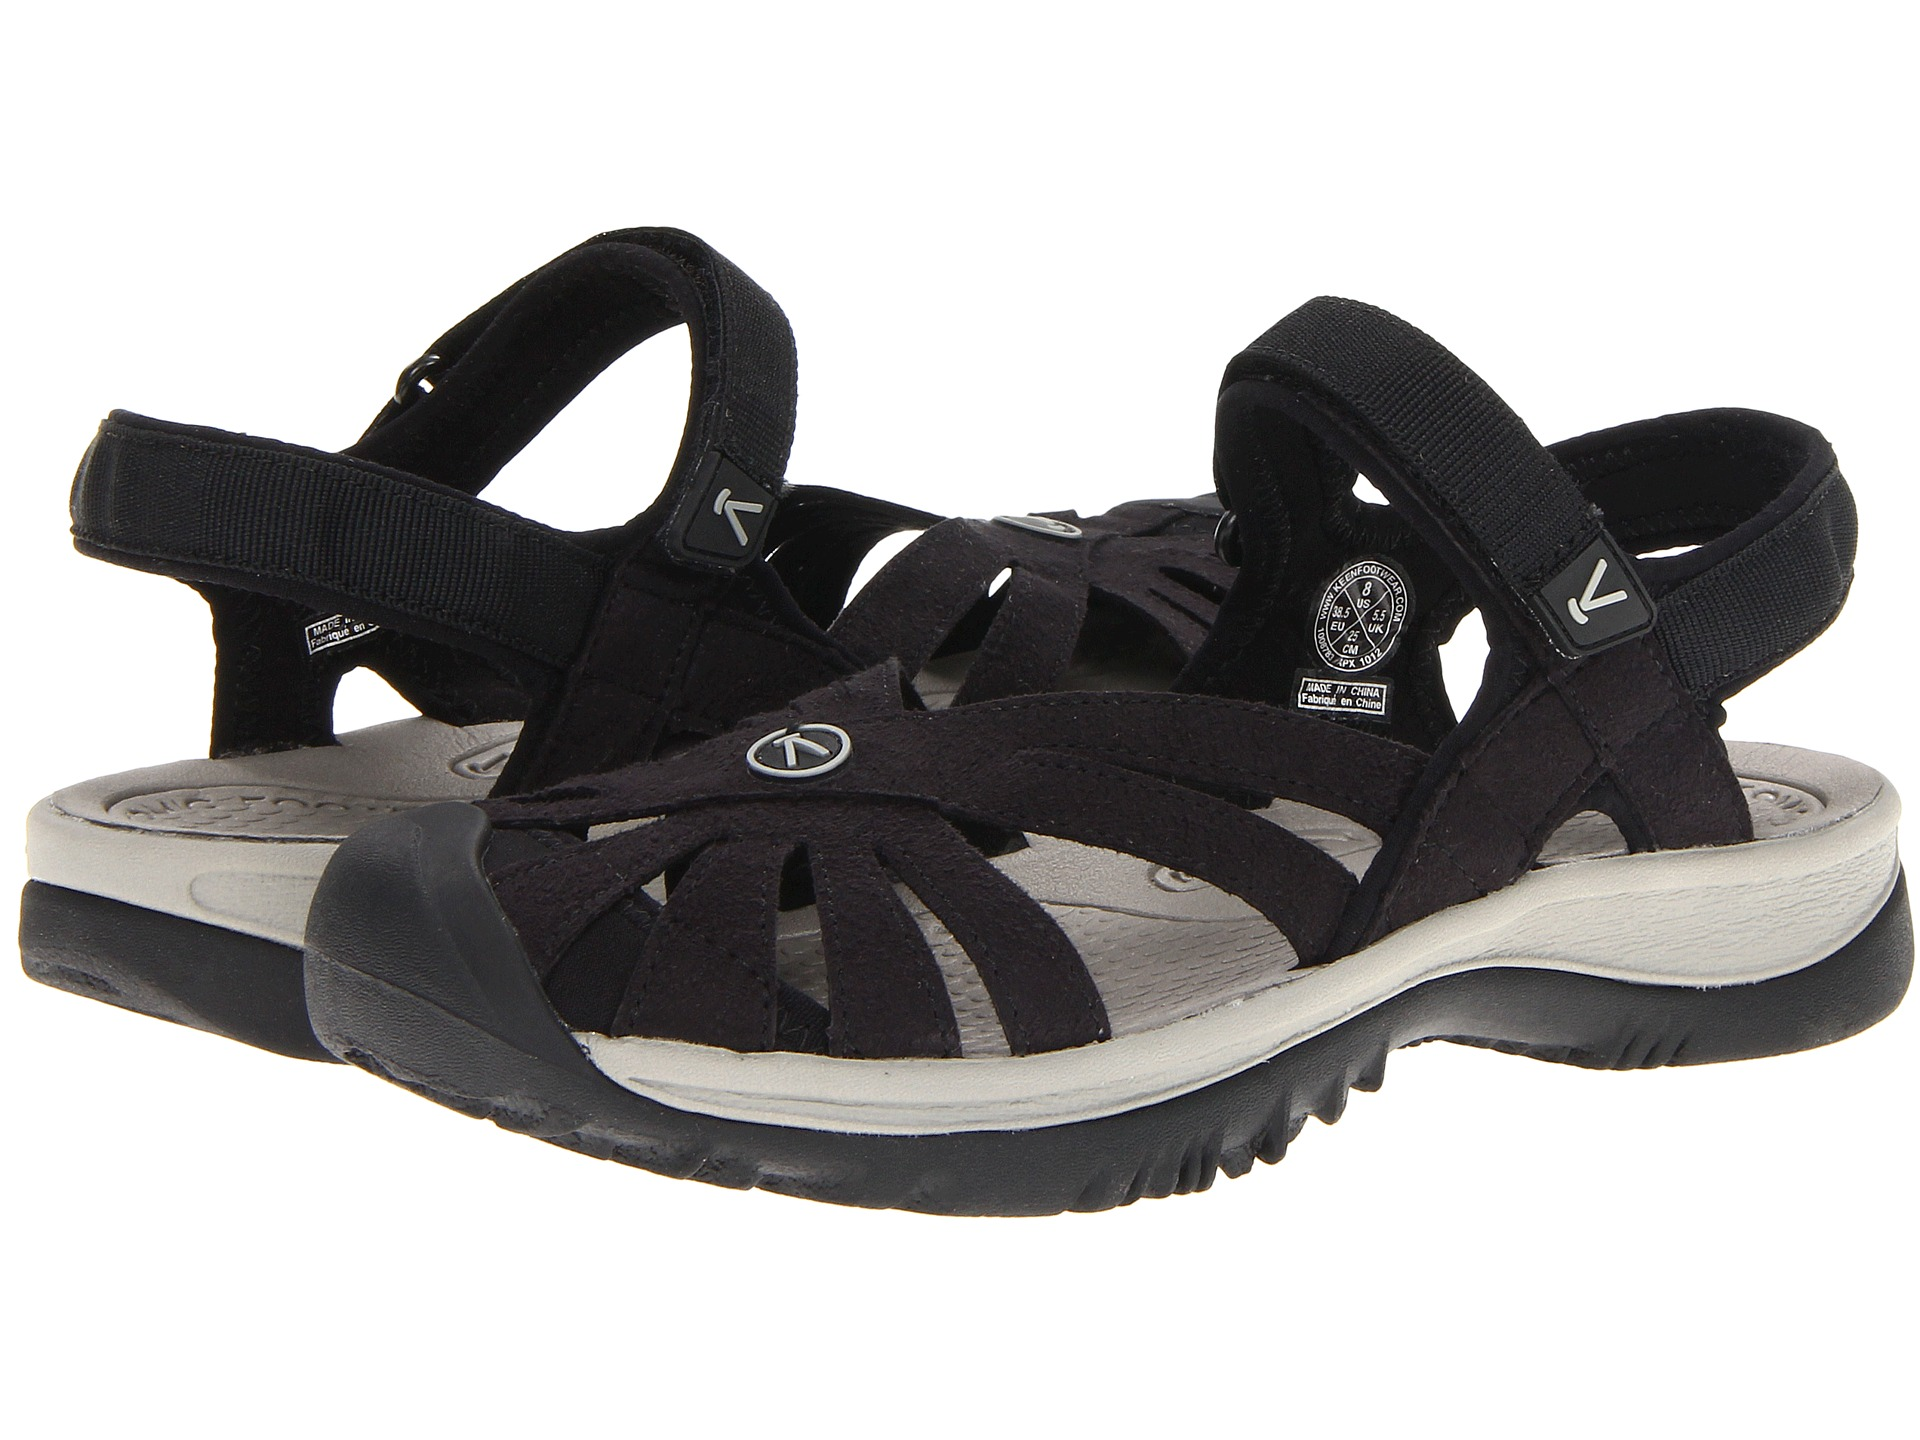 Keen Rose Sandal Black Neutral Gray Zappos Com Free